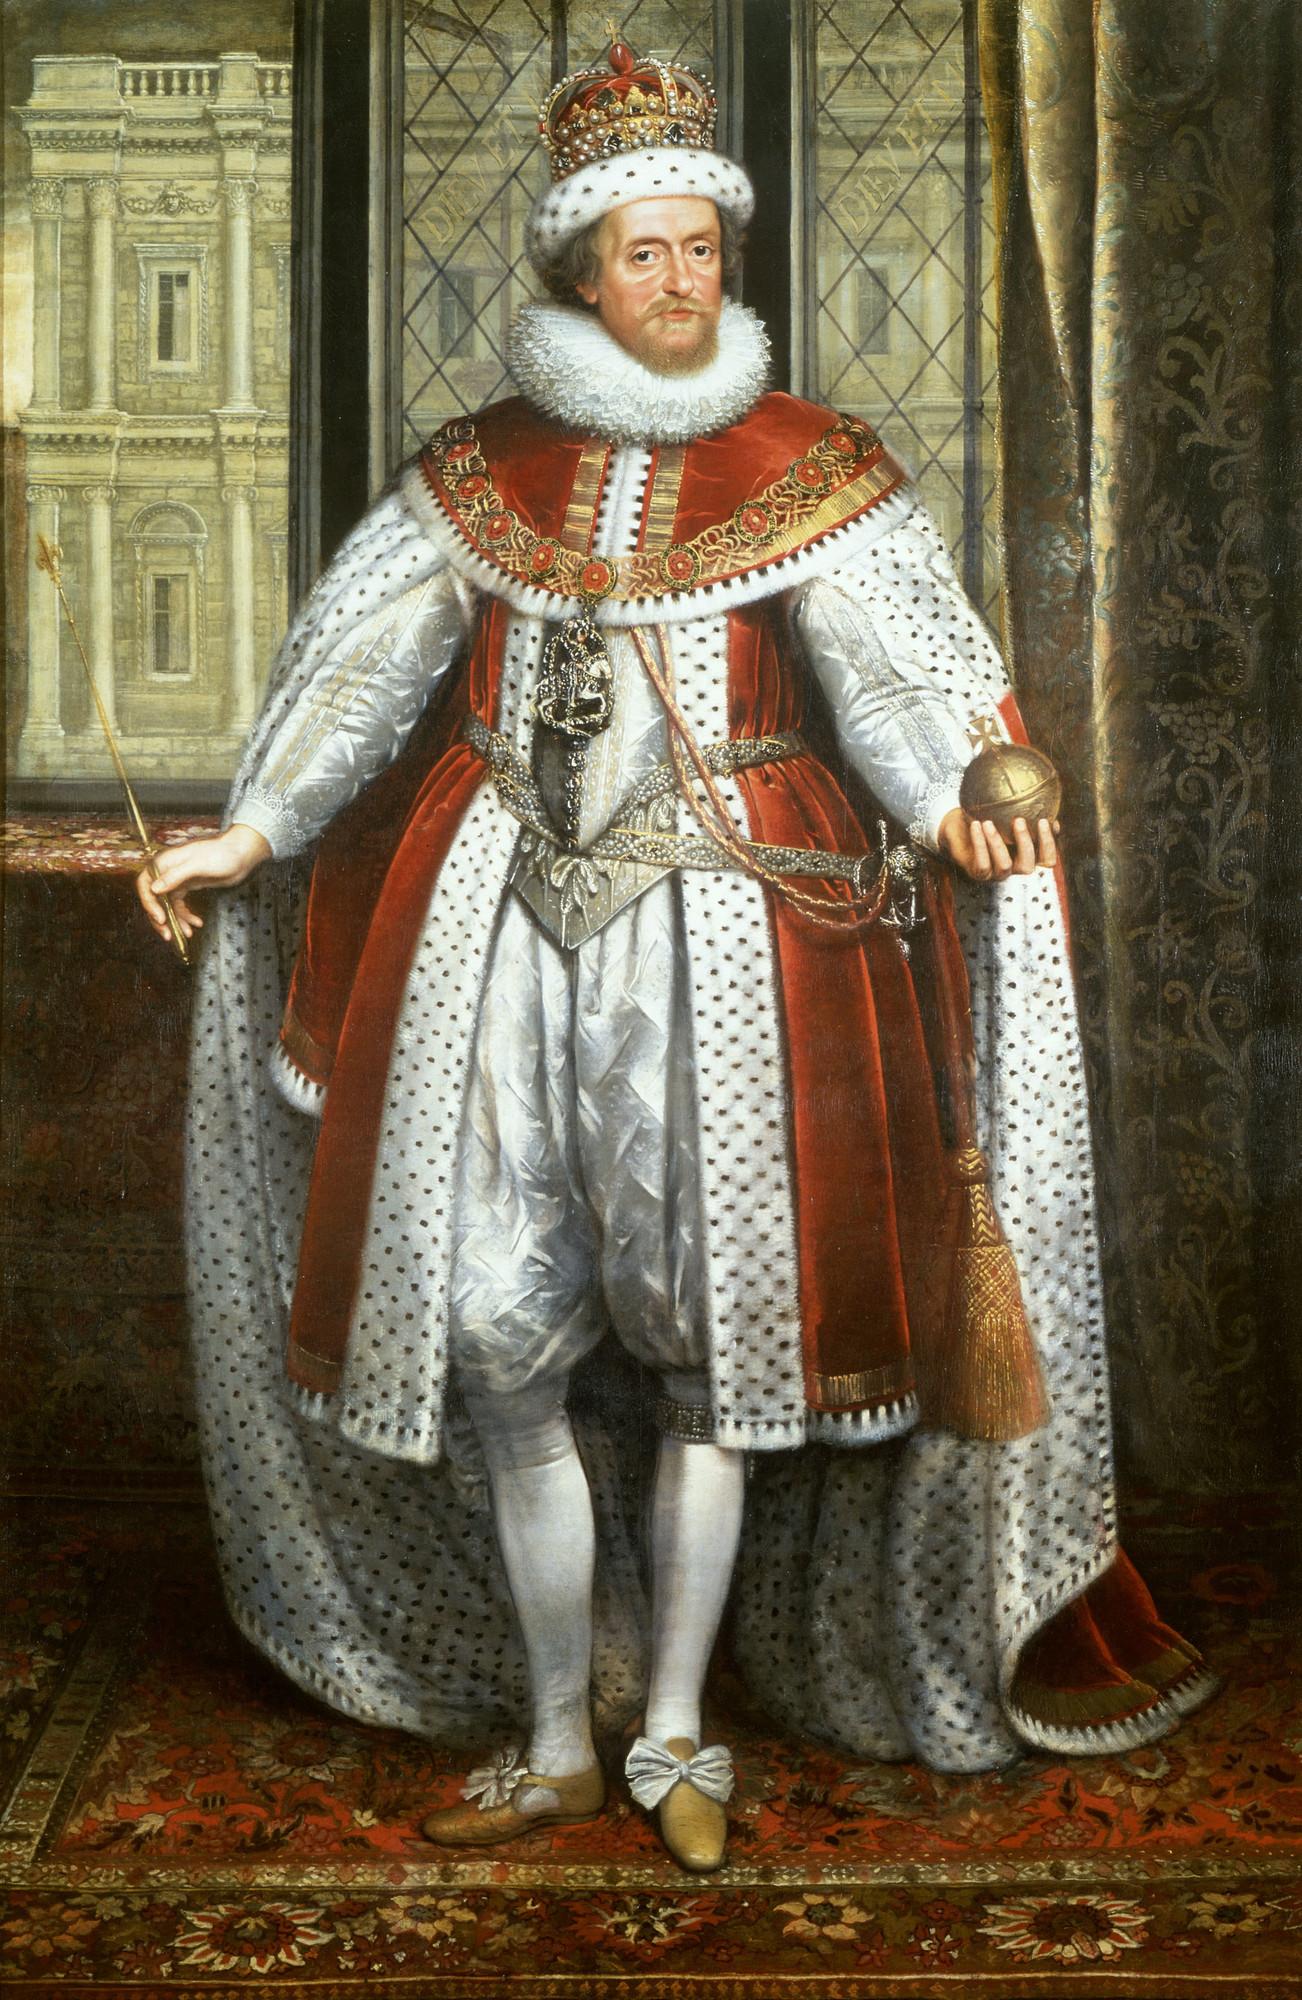 King James I of England and VI of Scotland, nice closeted nerd guy